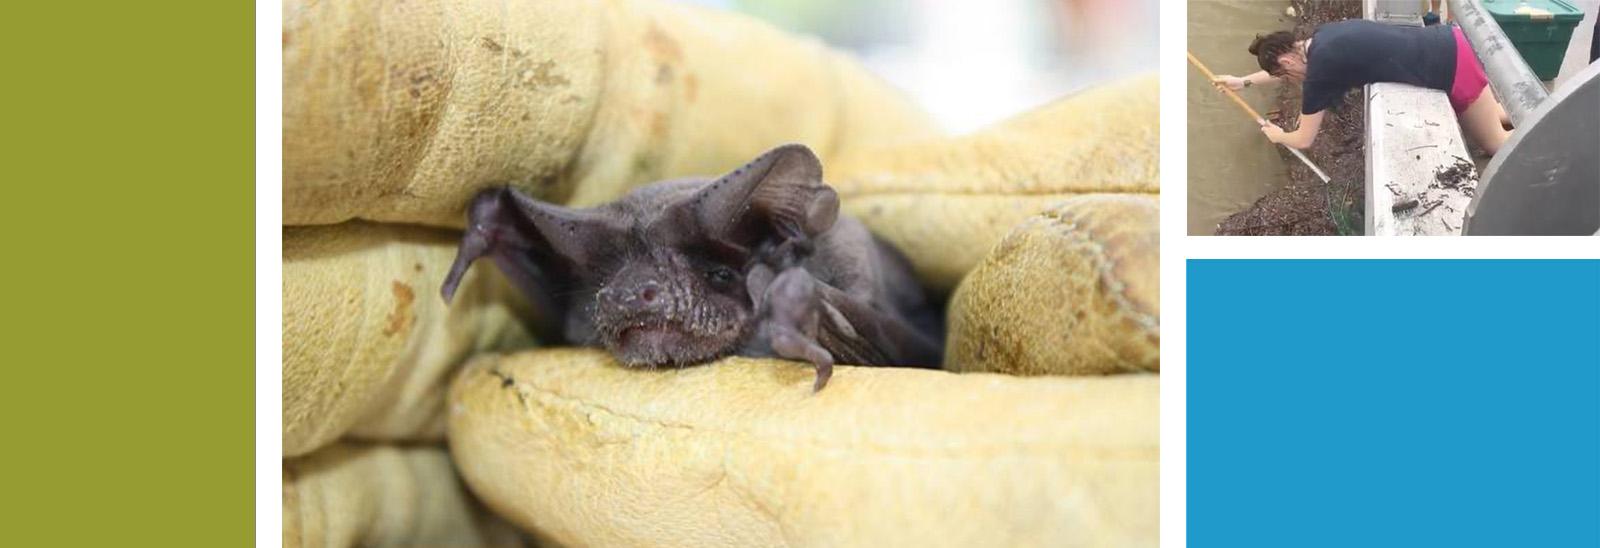 Houston Bat Rescue